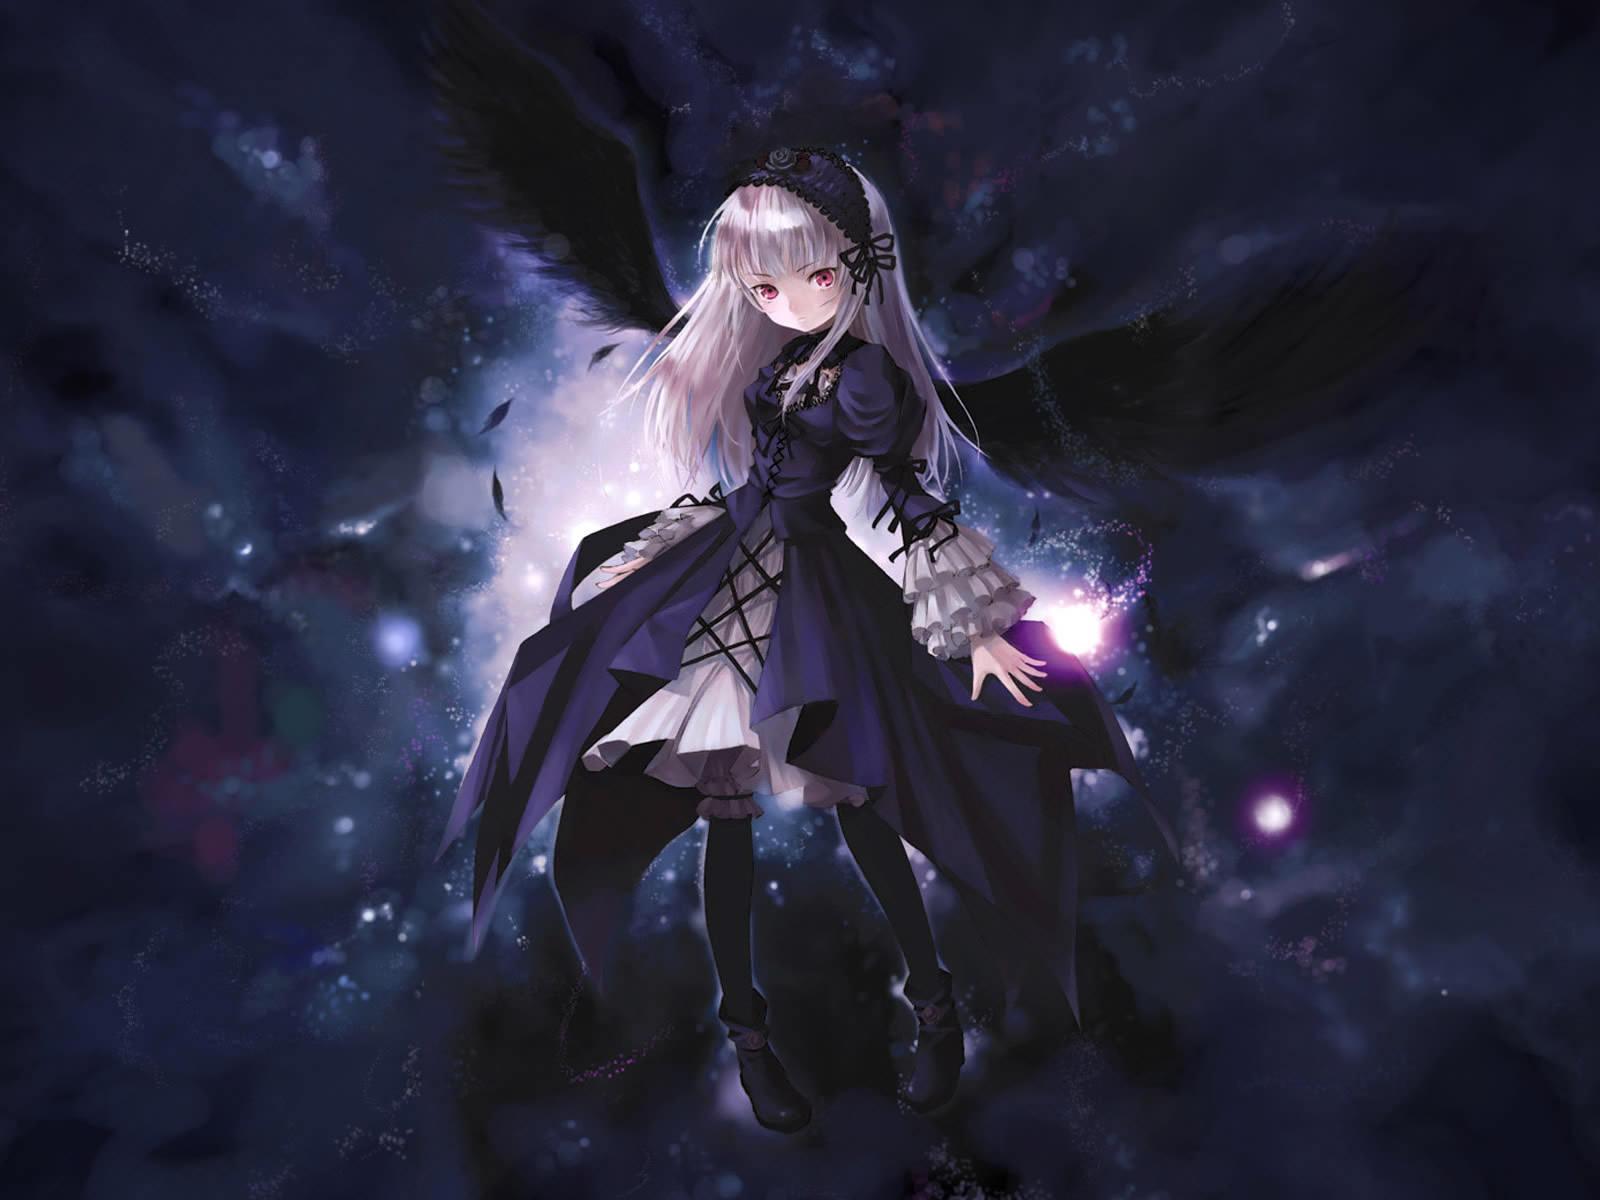 Anime Girl Wallpaperstop 1600x1200